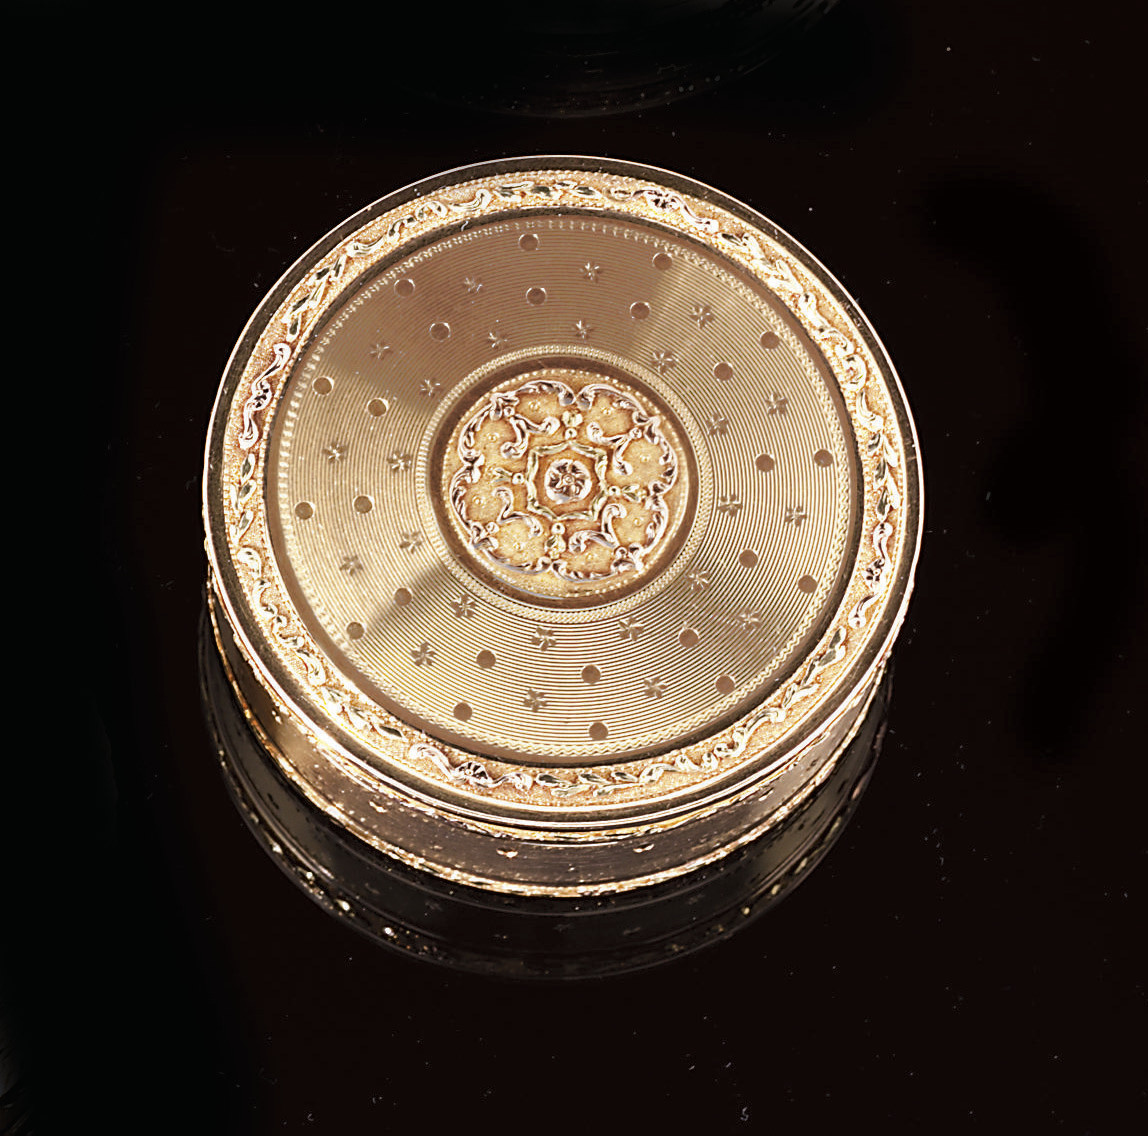 A LOUIS XVI THREE-COLOUR GOLD BONBONNIÈRE